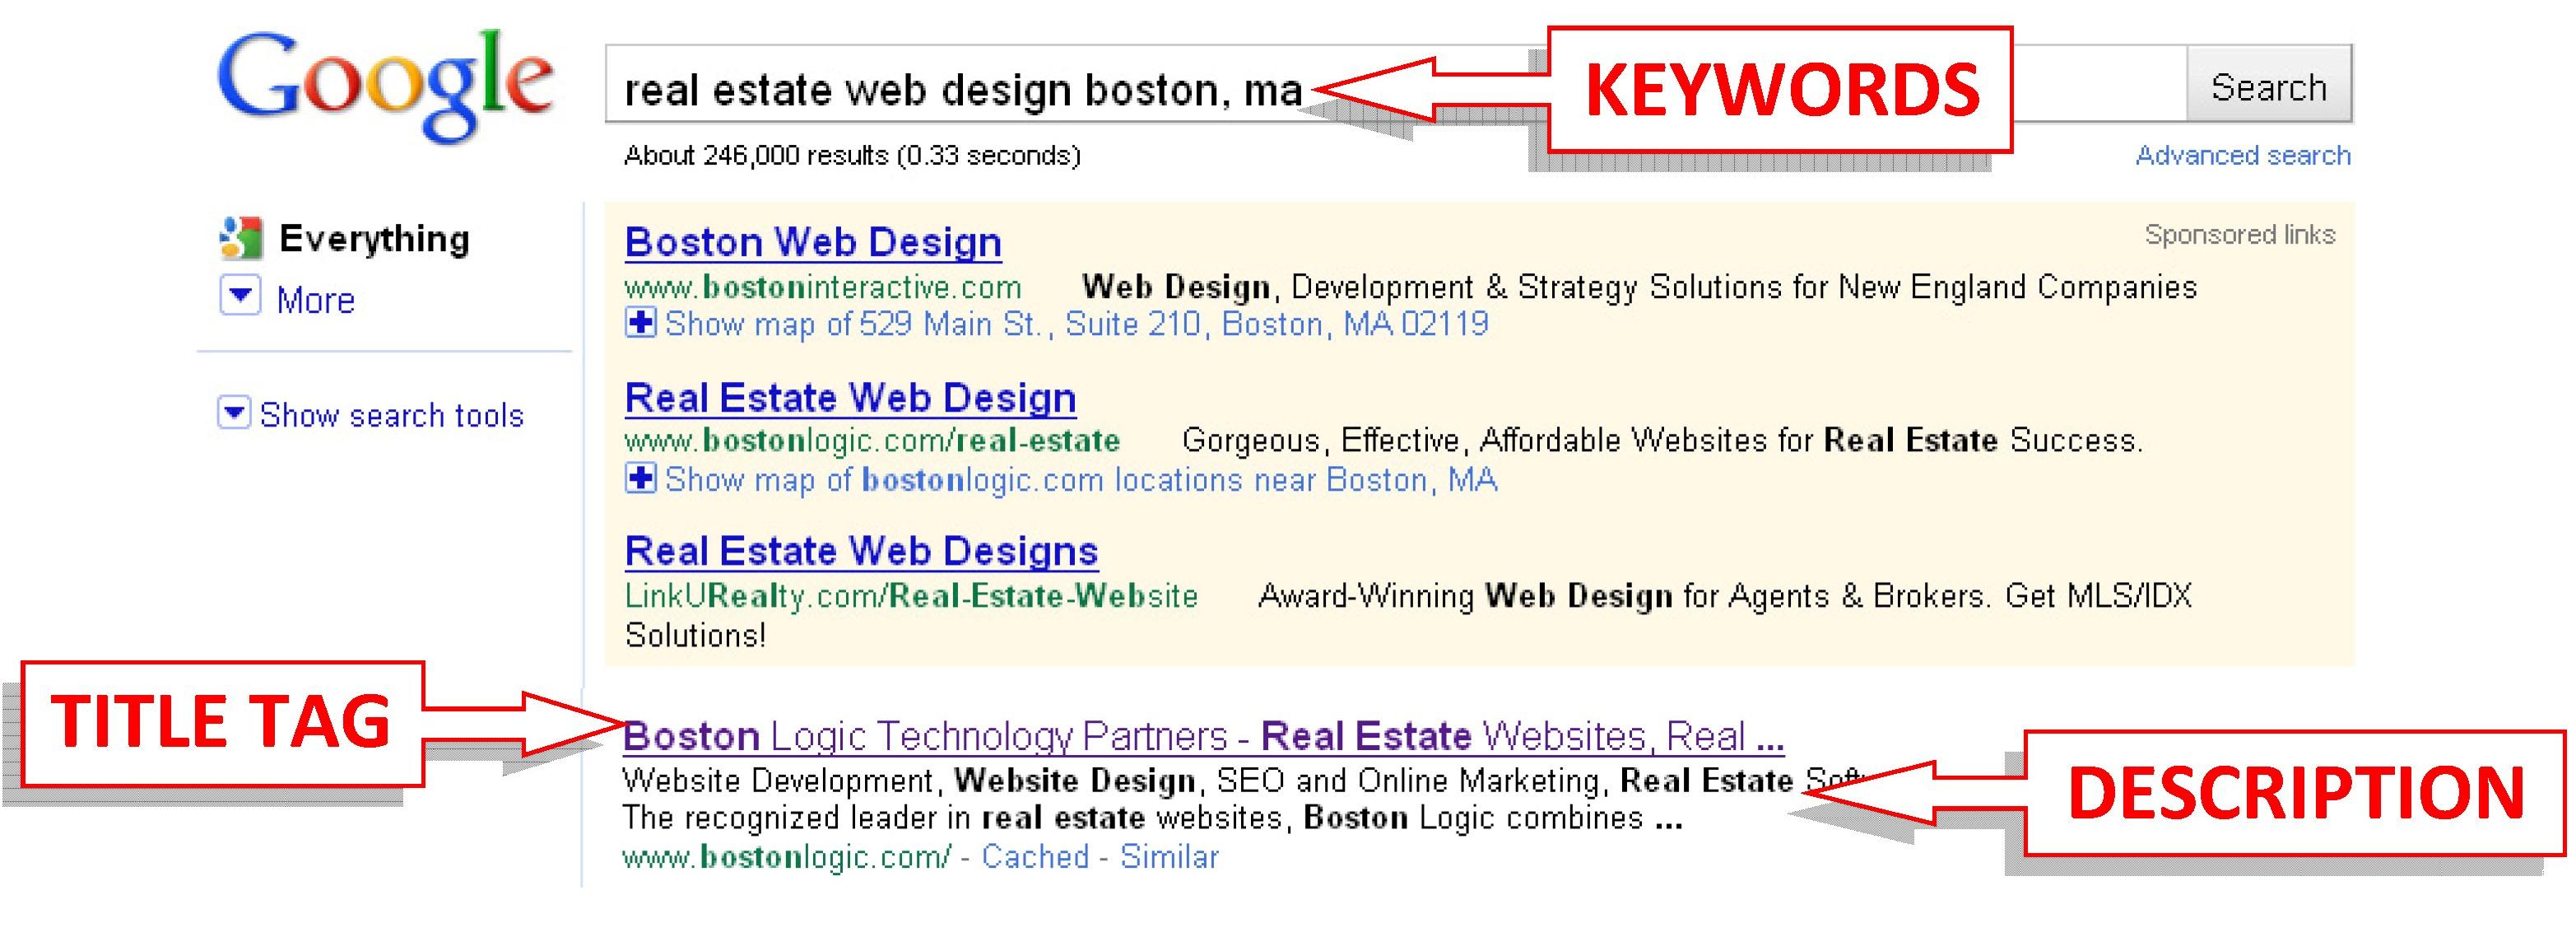 Search Engine Optimization Tutorial - My Fast Blog